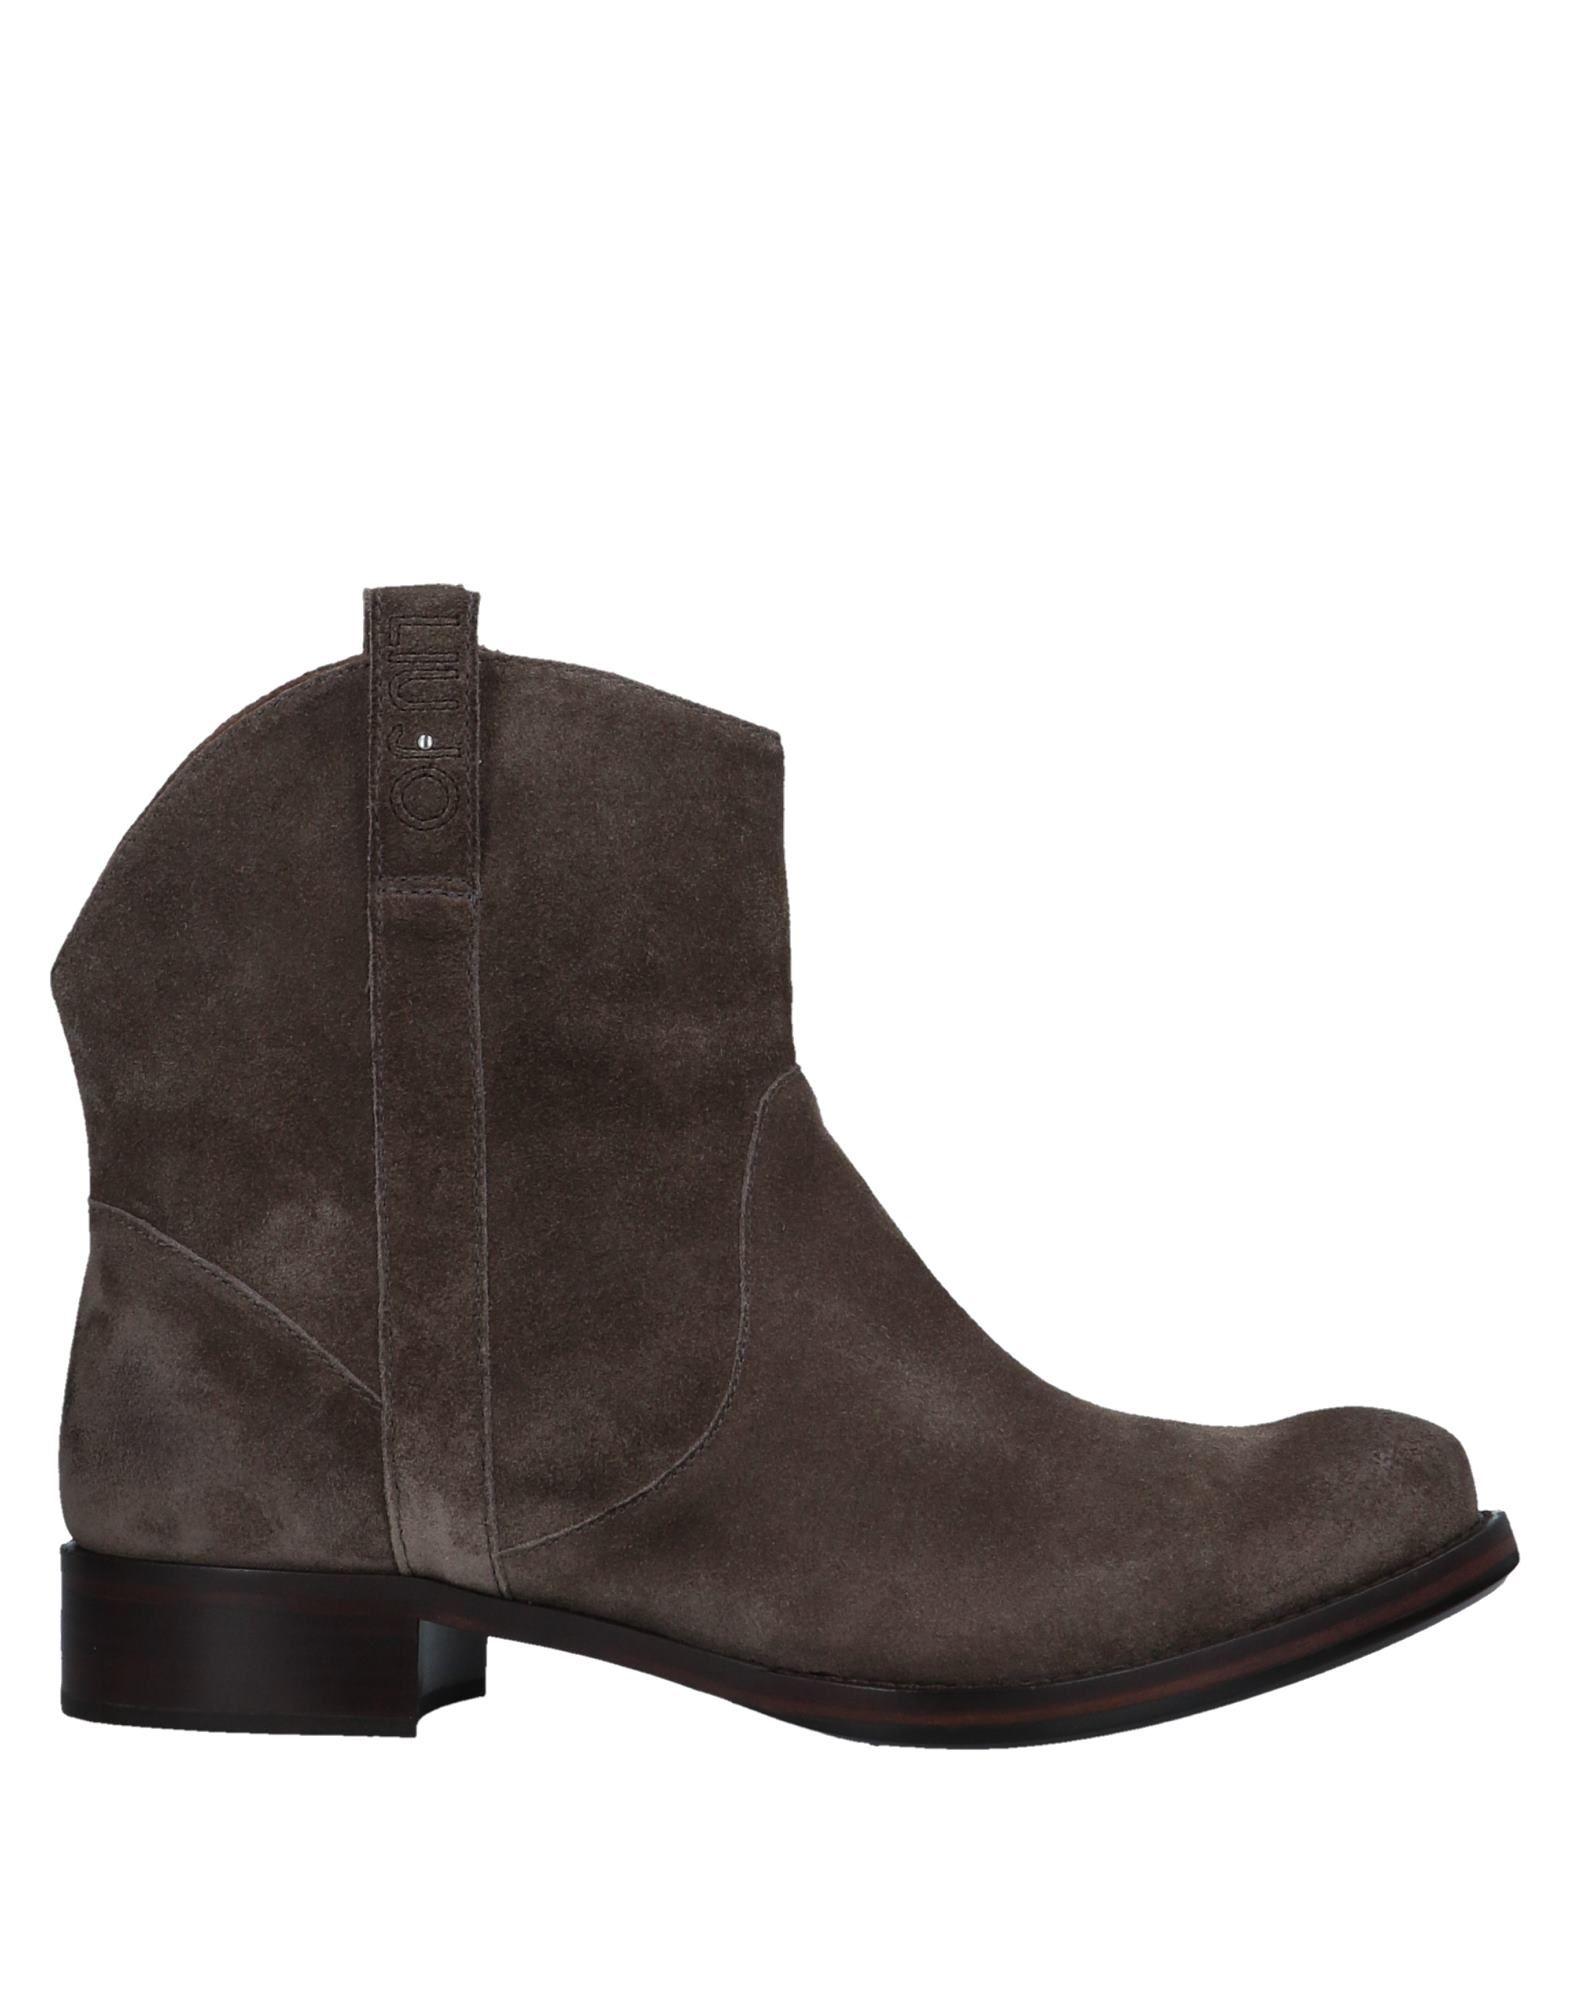 Bottine Liu •Jo Shoes Femme - Bottines Liu •Jo Shoes Kaki Remise de marque